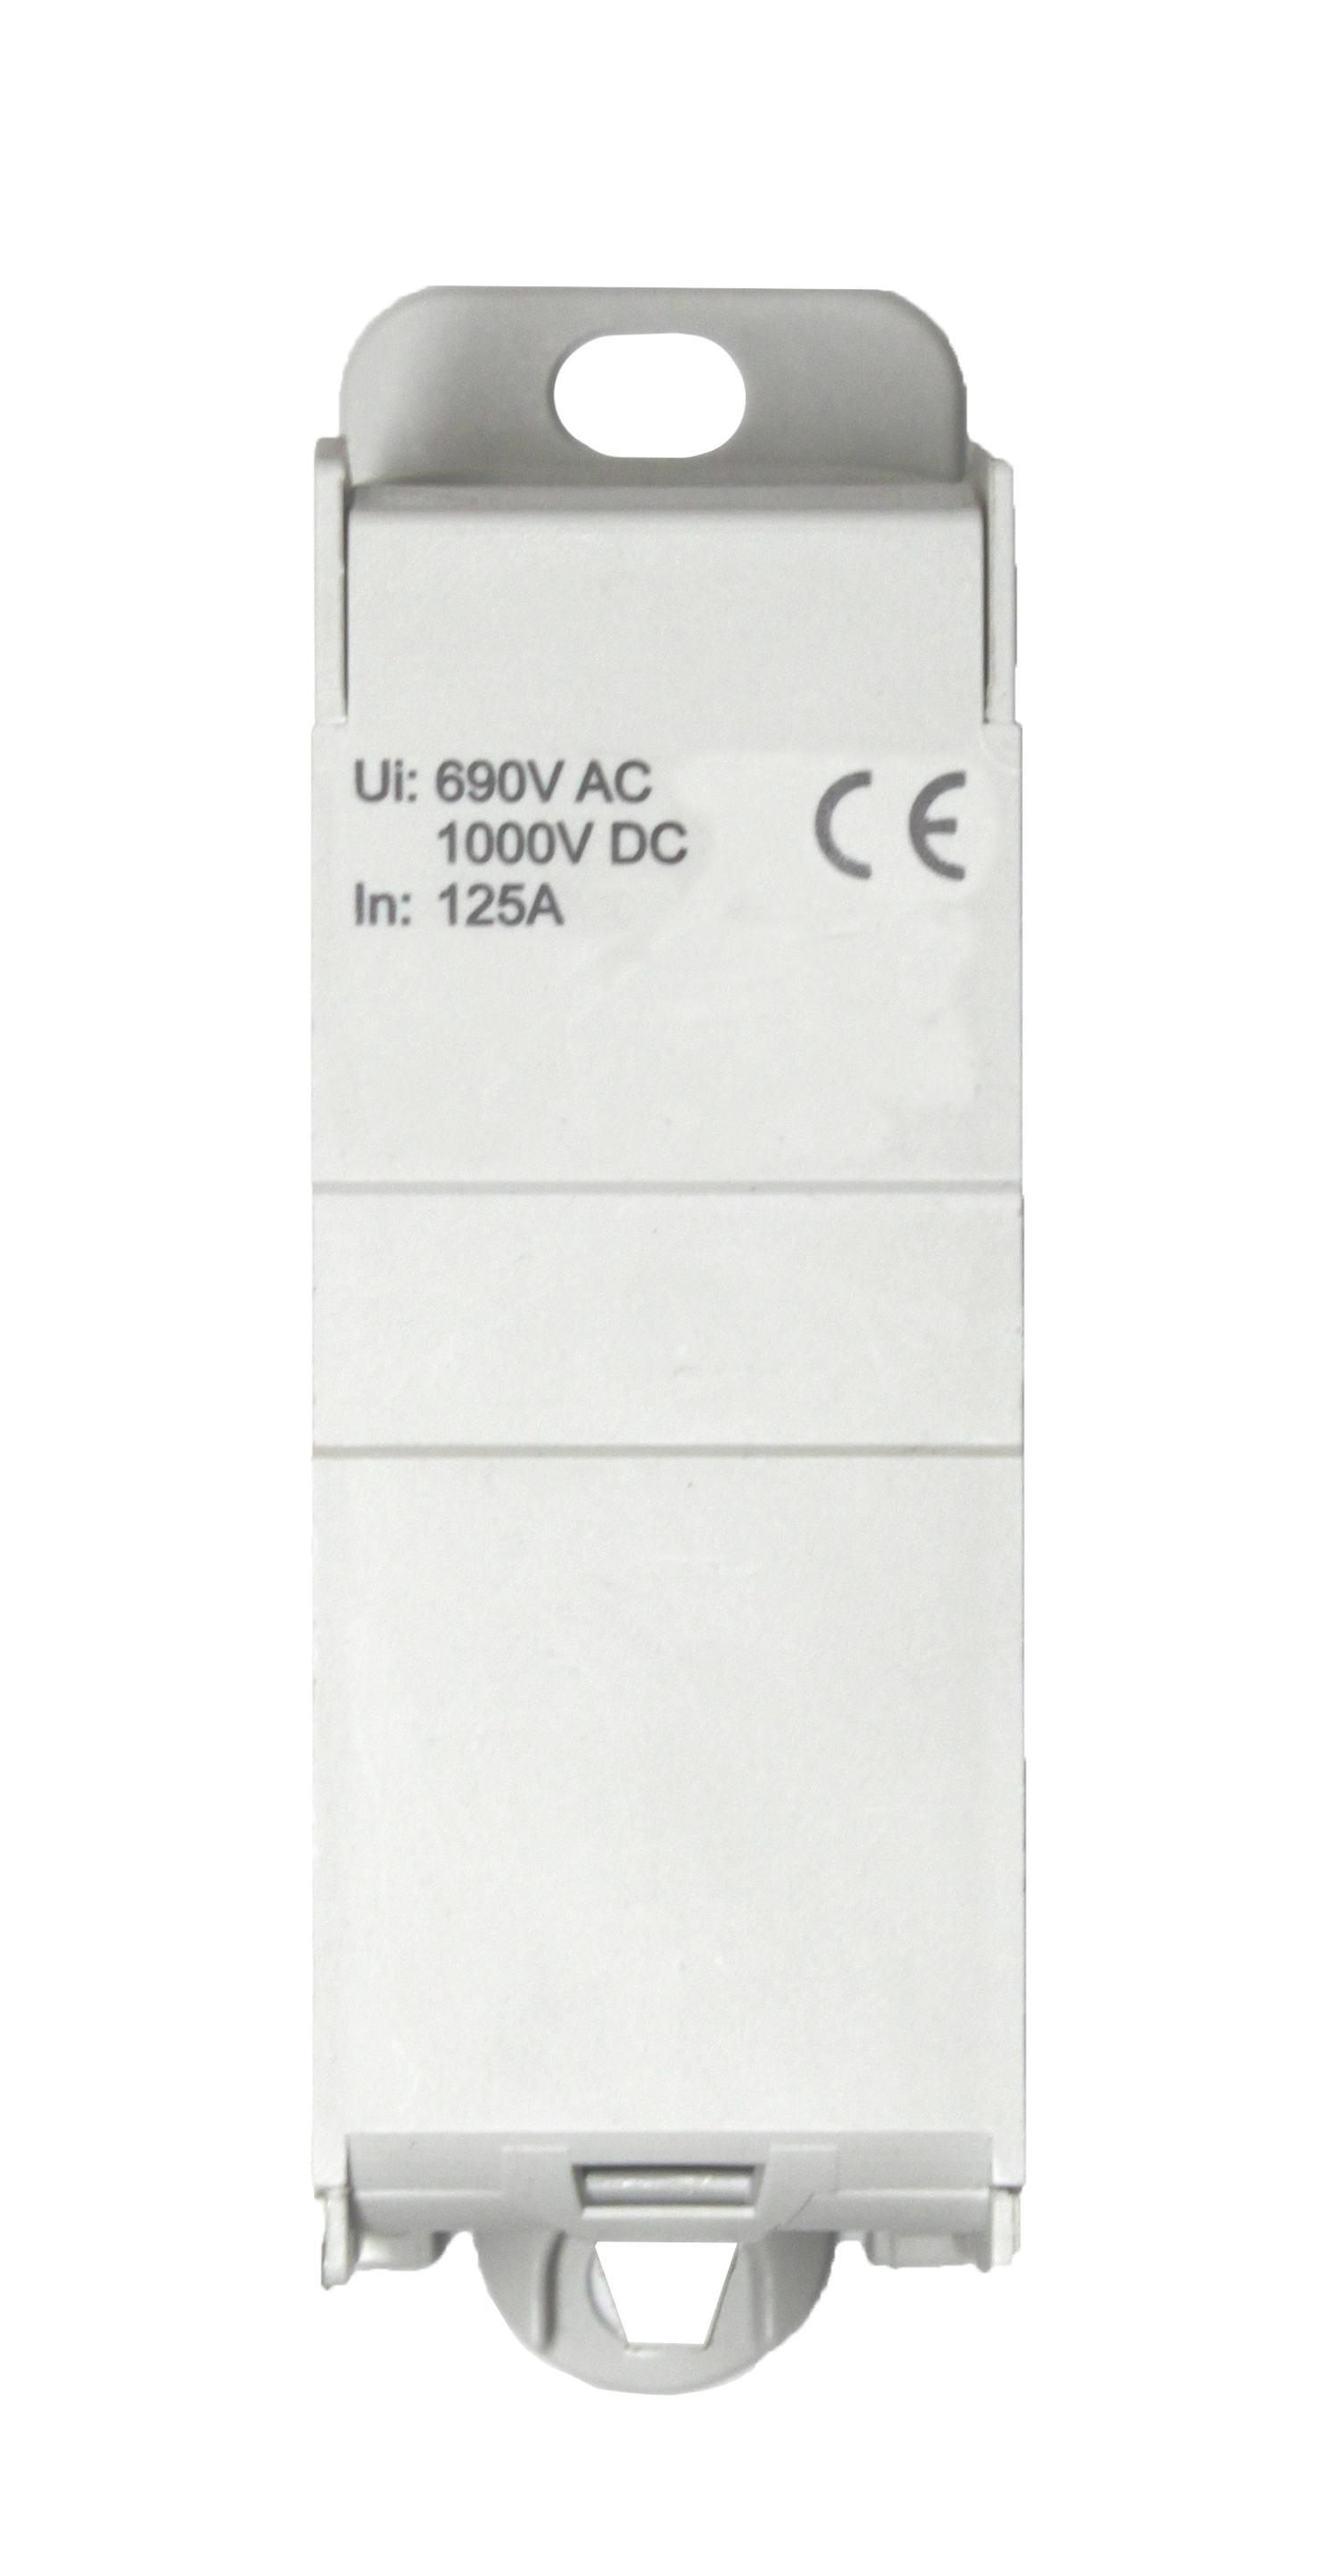 1 Stk Anschlussblock, 1-polig, 125A, zu 1x35mm², ab 6x16mm² IKB01135--